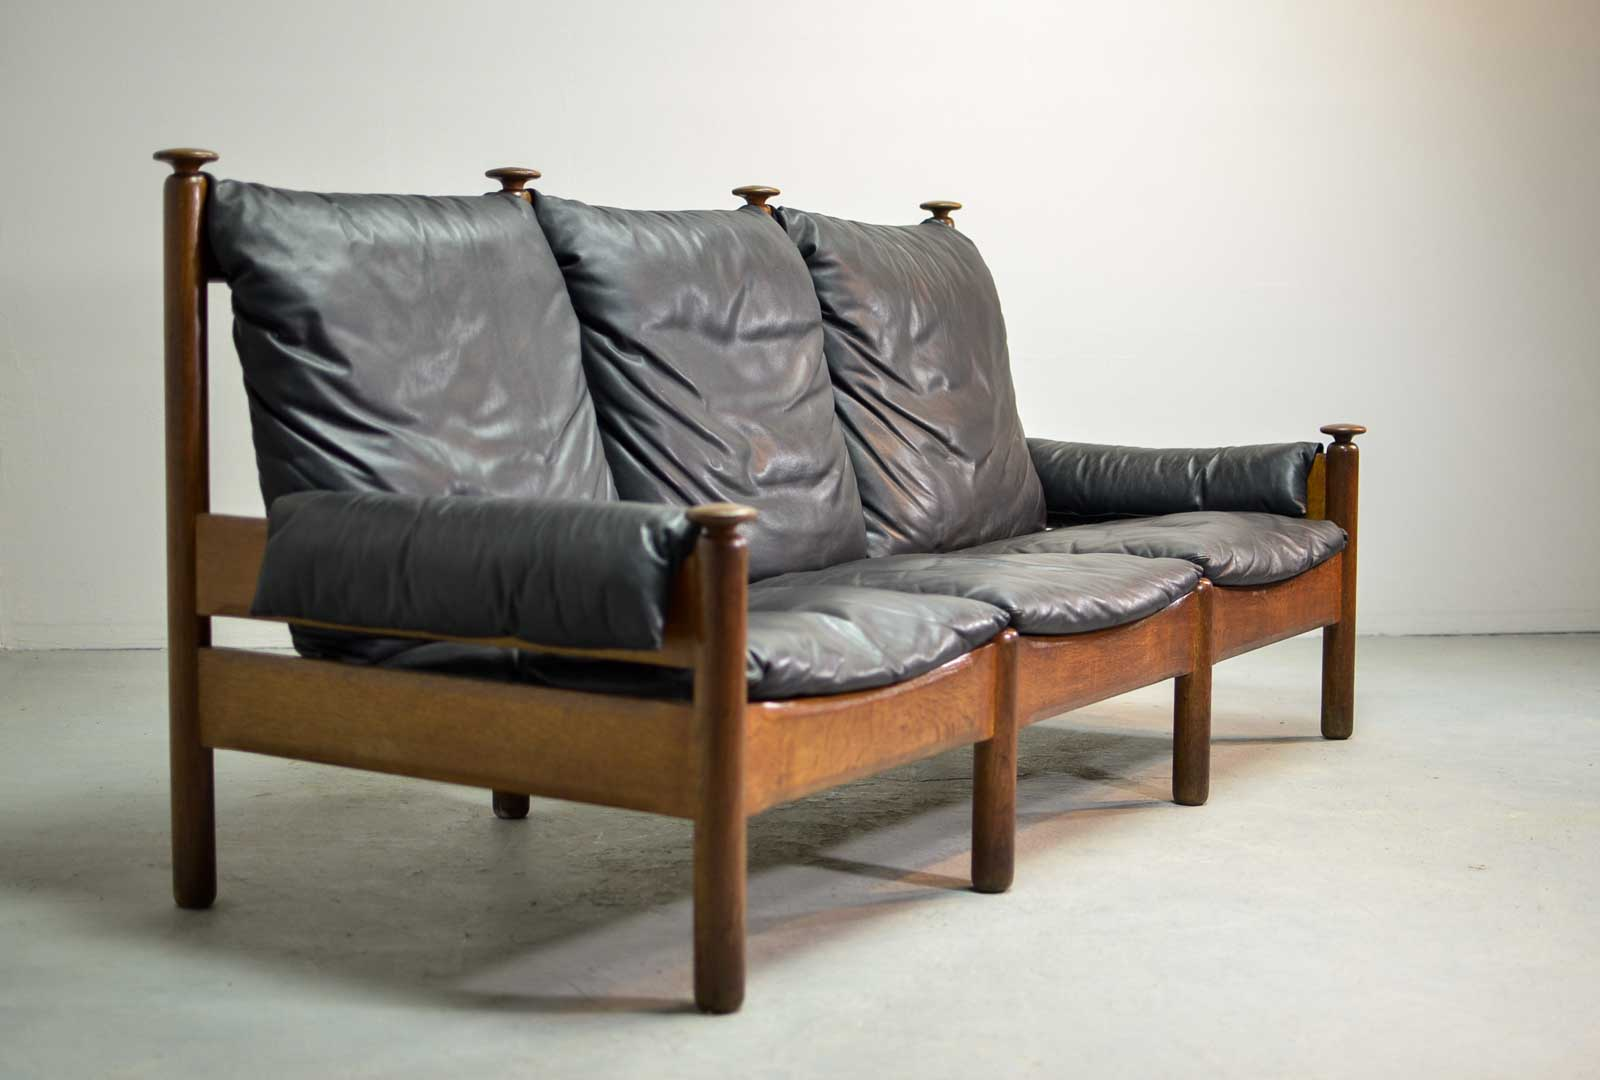 Sturdy Mid Century Smooth Black Leather Scandinavian 3 Seat Sofa, 1960s